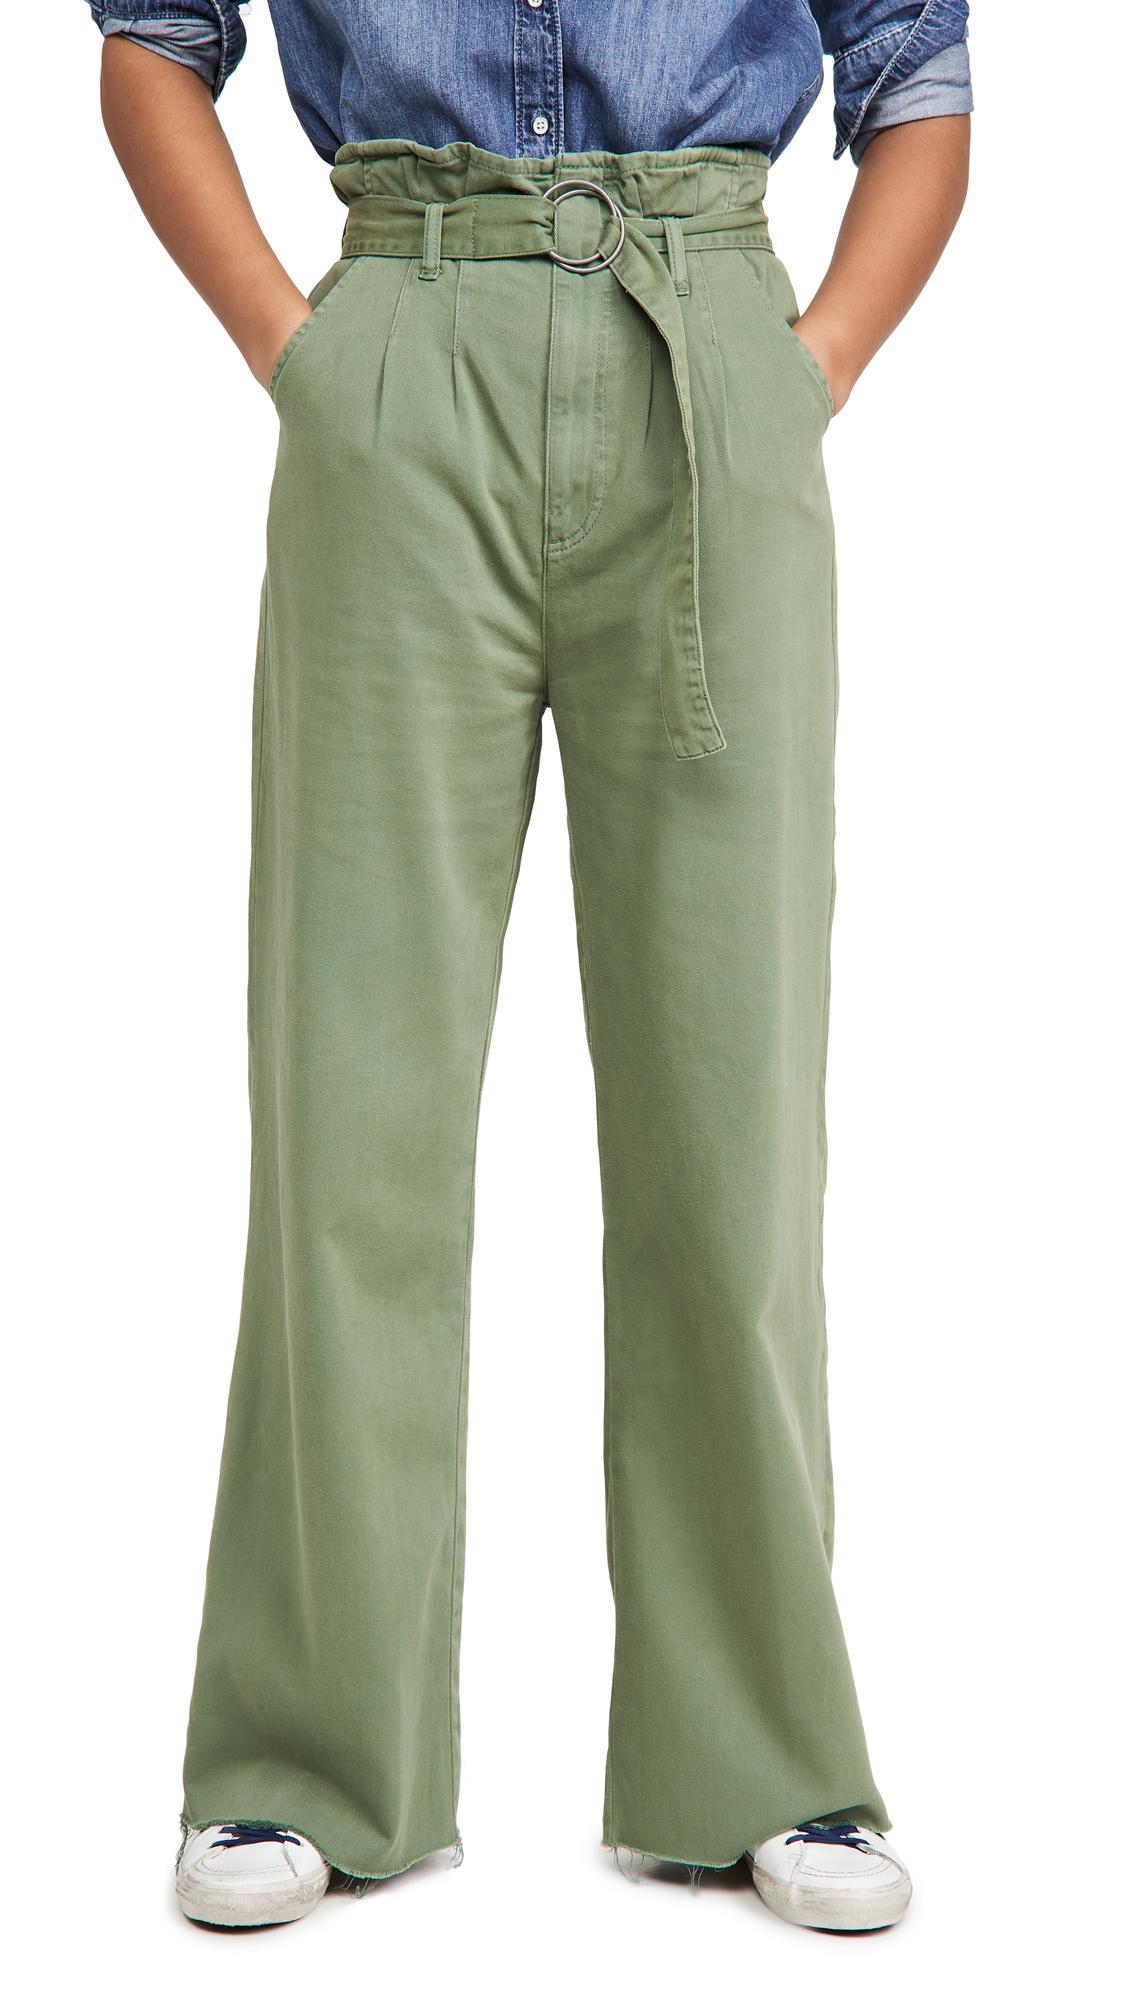 Boyish The Clancy Pants